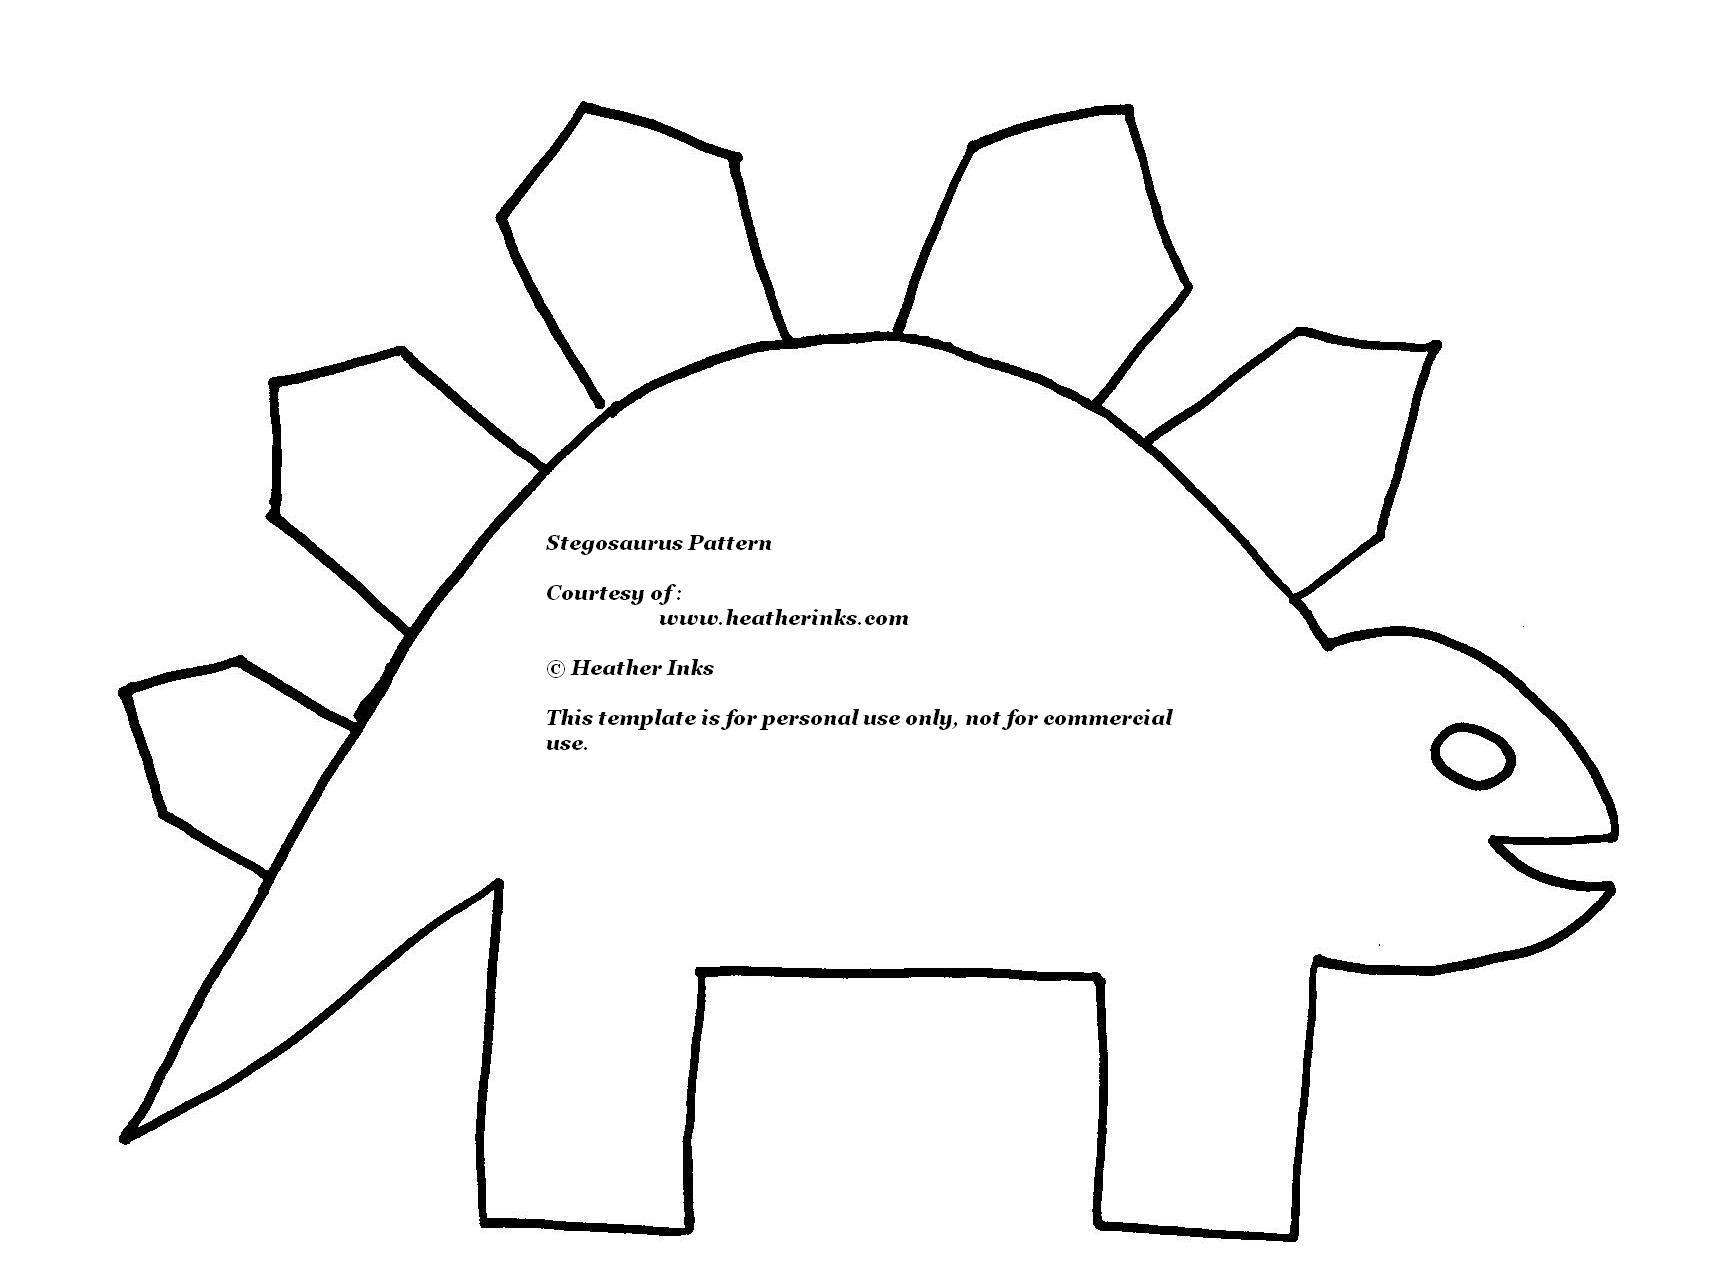 Stegosaurus Template